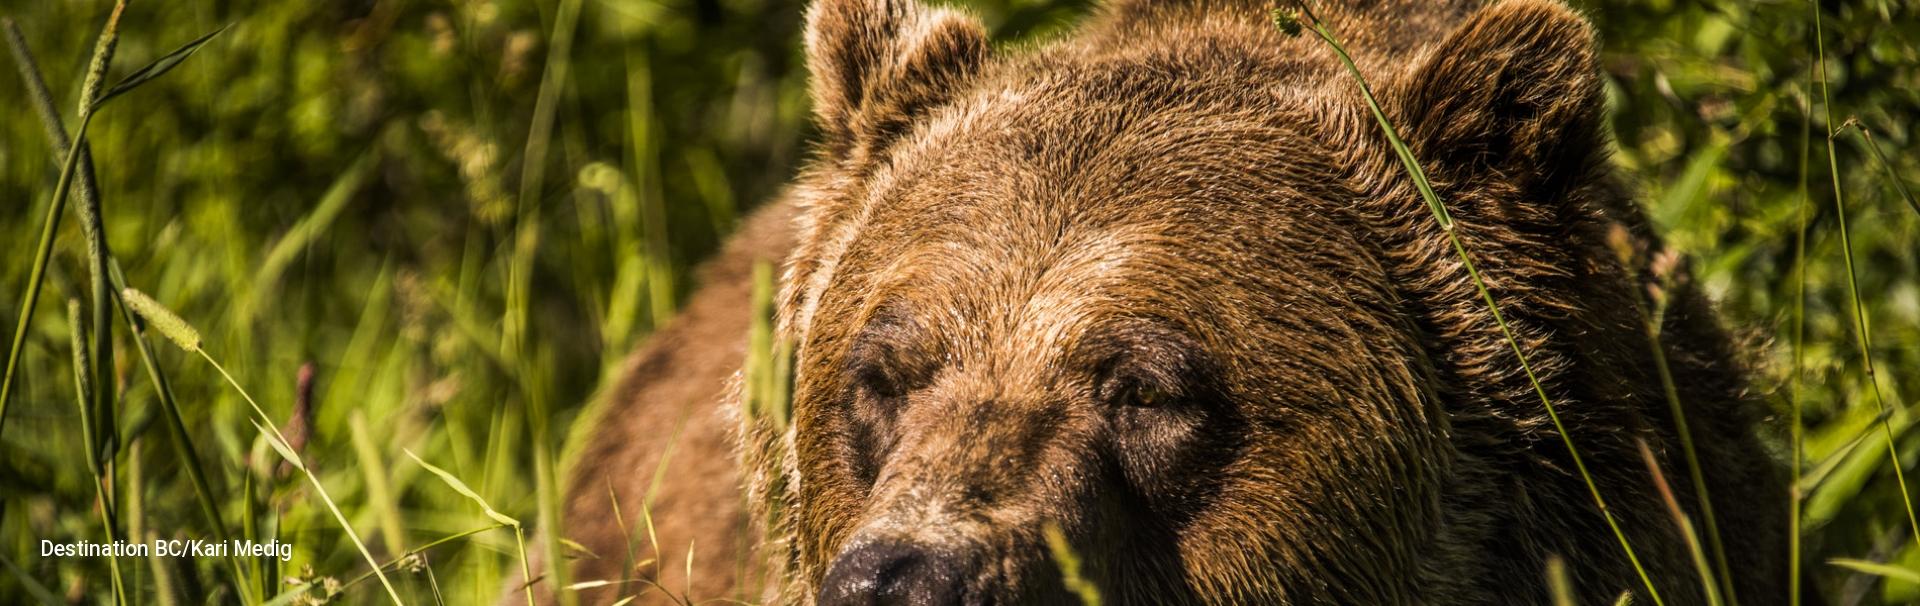 Grizzly Bear at Kicking Horse Mountain Resort